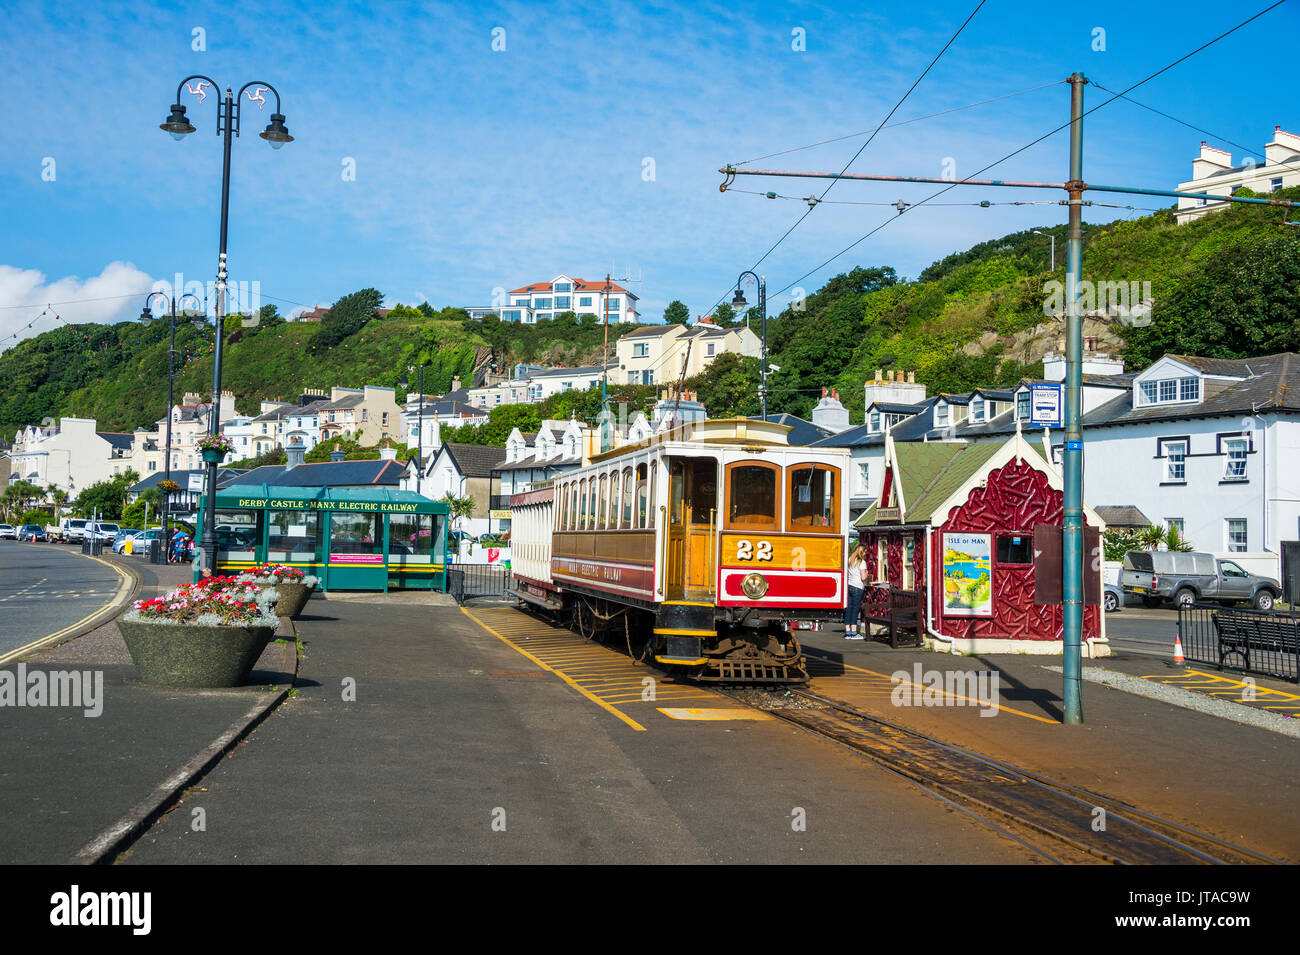 Old tram in Douglas, Isle of Man, crown dependency of the United Kingdom, Europe - Stock Image